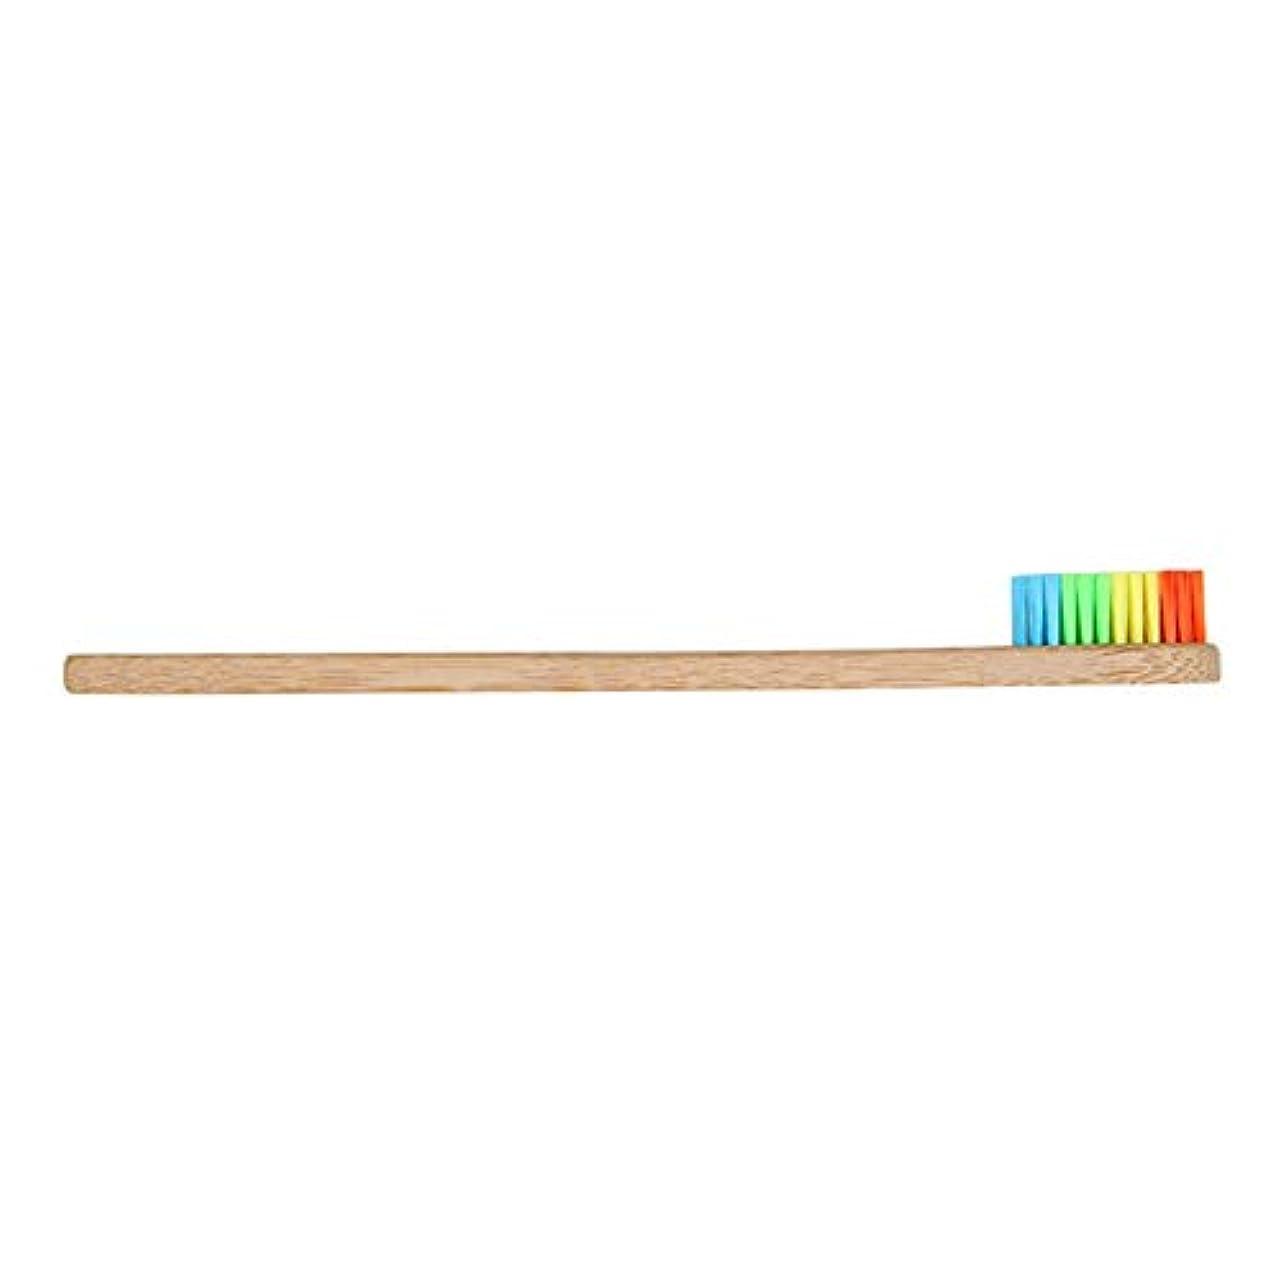 MAYouth 1/4ピース歯ブラシ竹木製ハンドルレインボーソフト剛毛オーラルケア歯ブラシ用大人子供